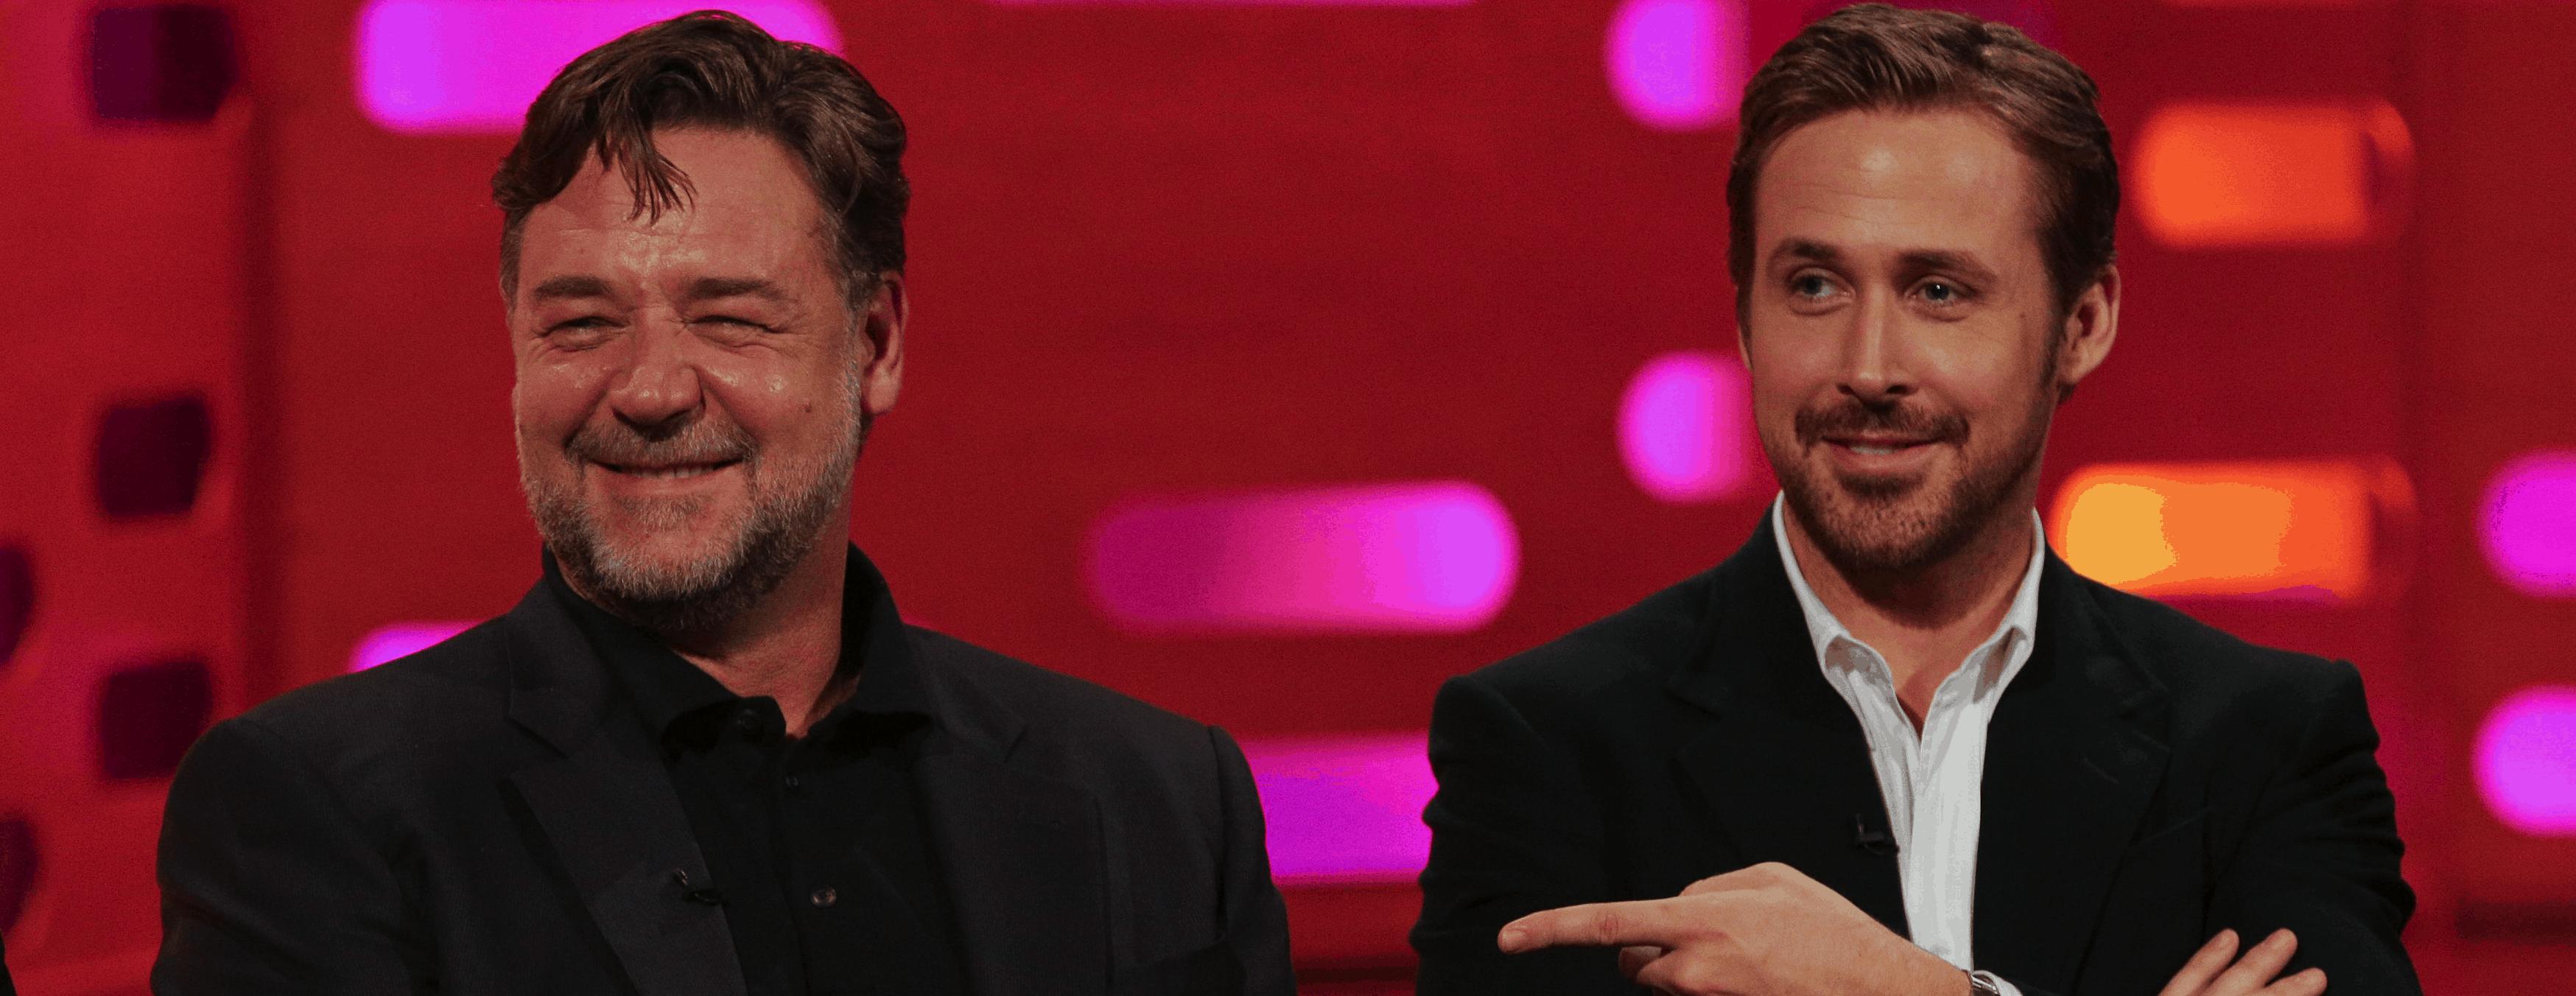 Ryan-Gosling-The-Graham-Norton-Show-2016-04